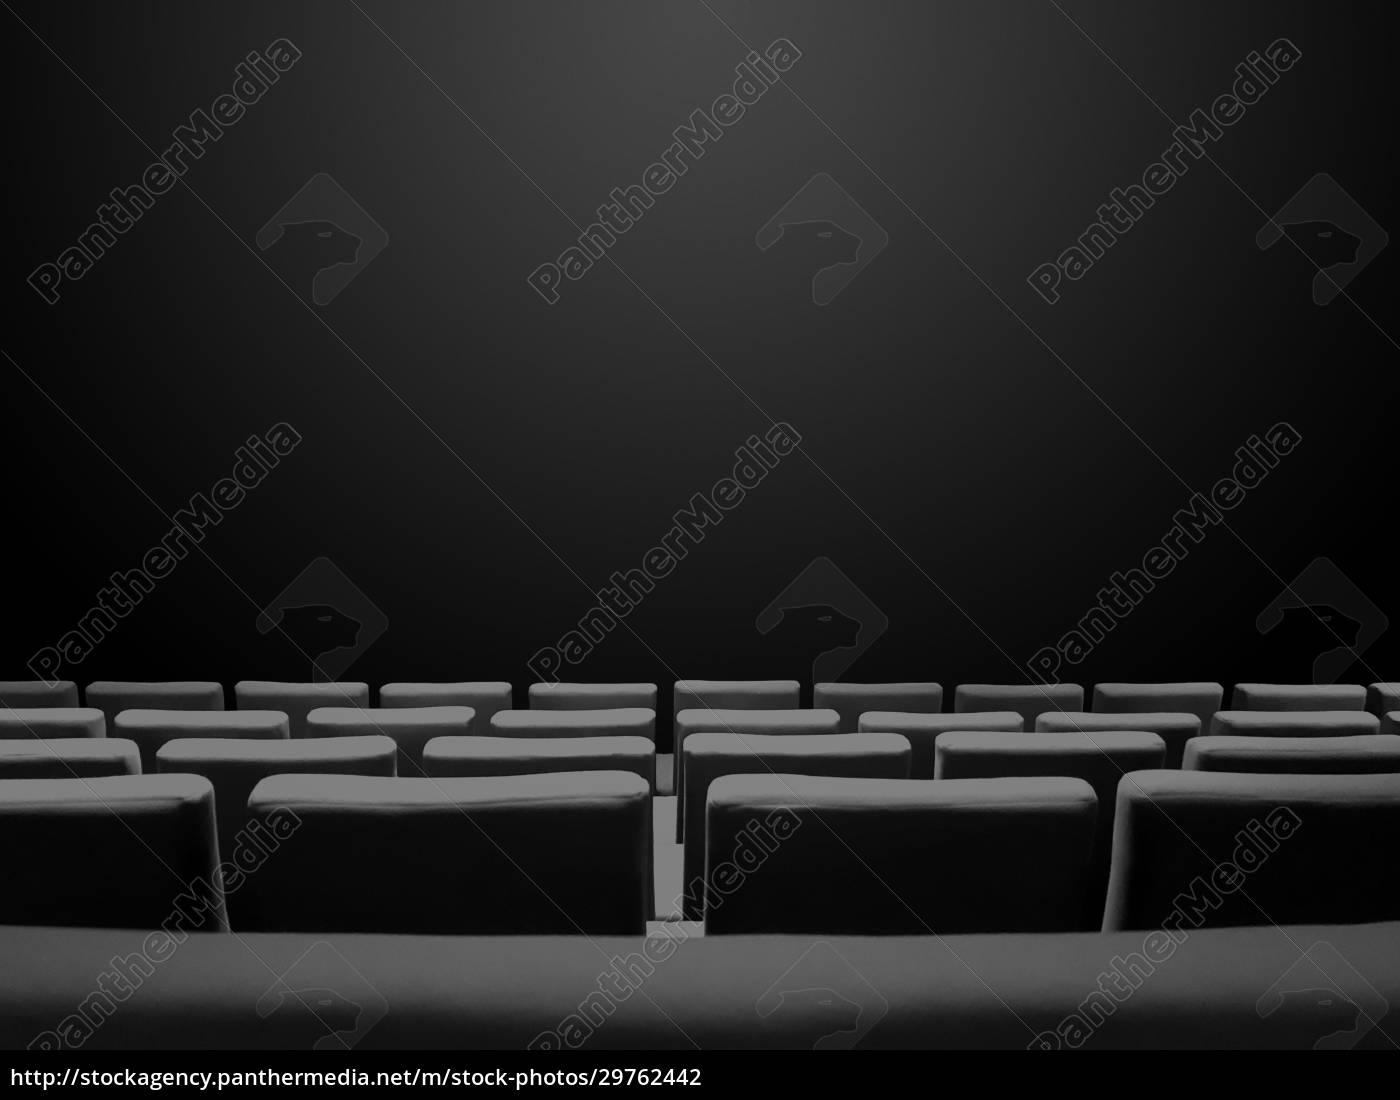 cinema, movie, theatre, with, seats, rows - 29762442